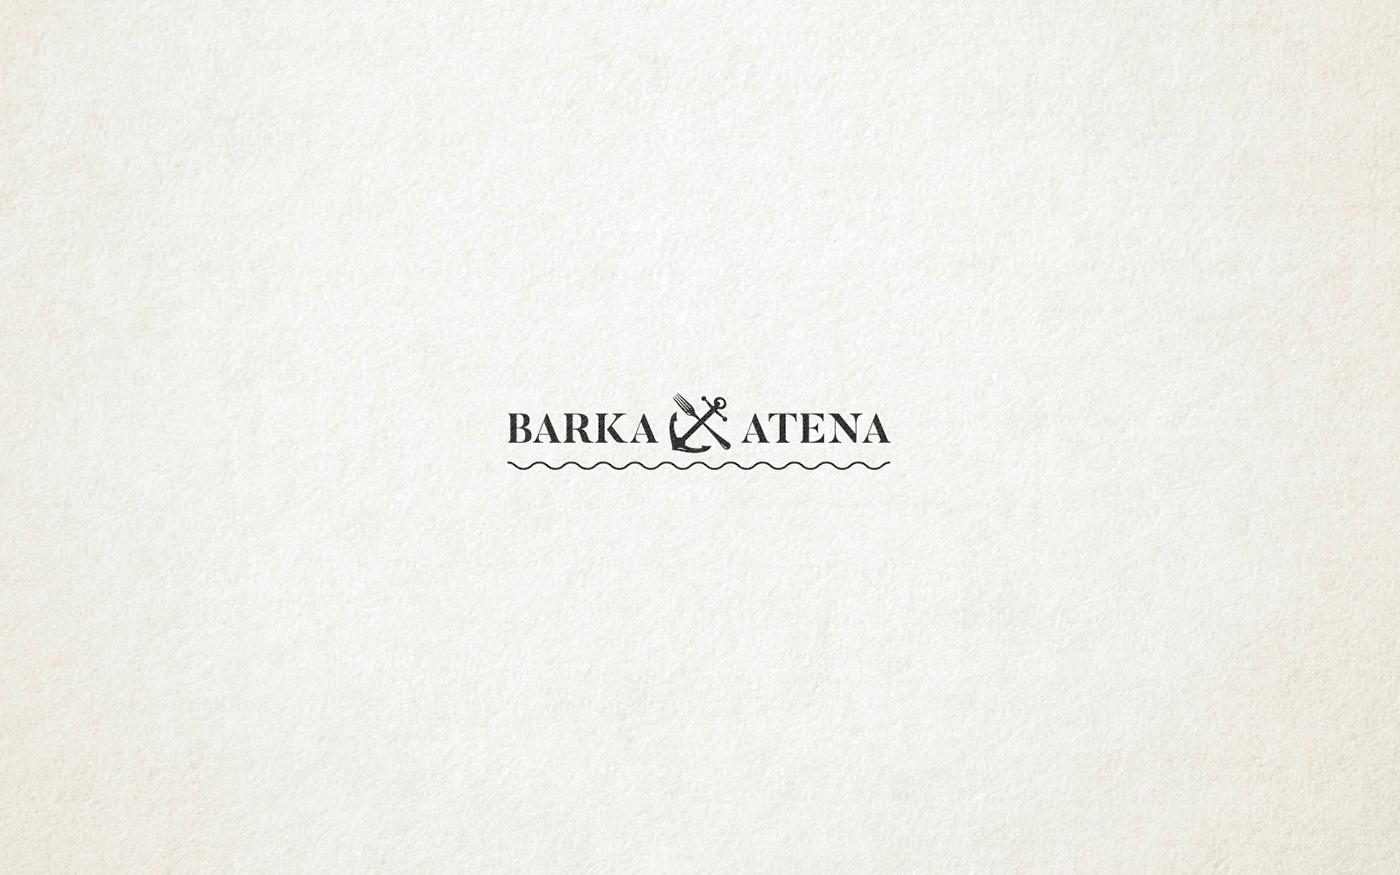 logo logofolio logos logodesign graphicdesign mark marks restaurant cancelary Spa